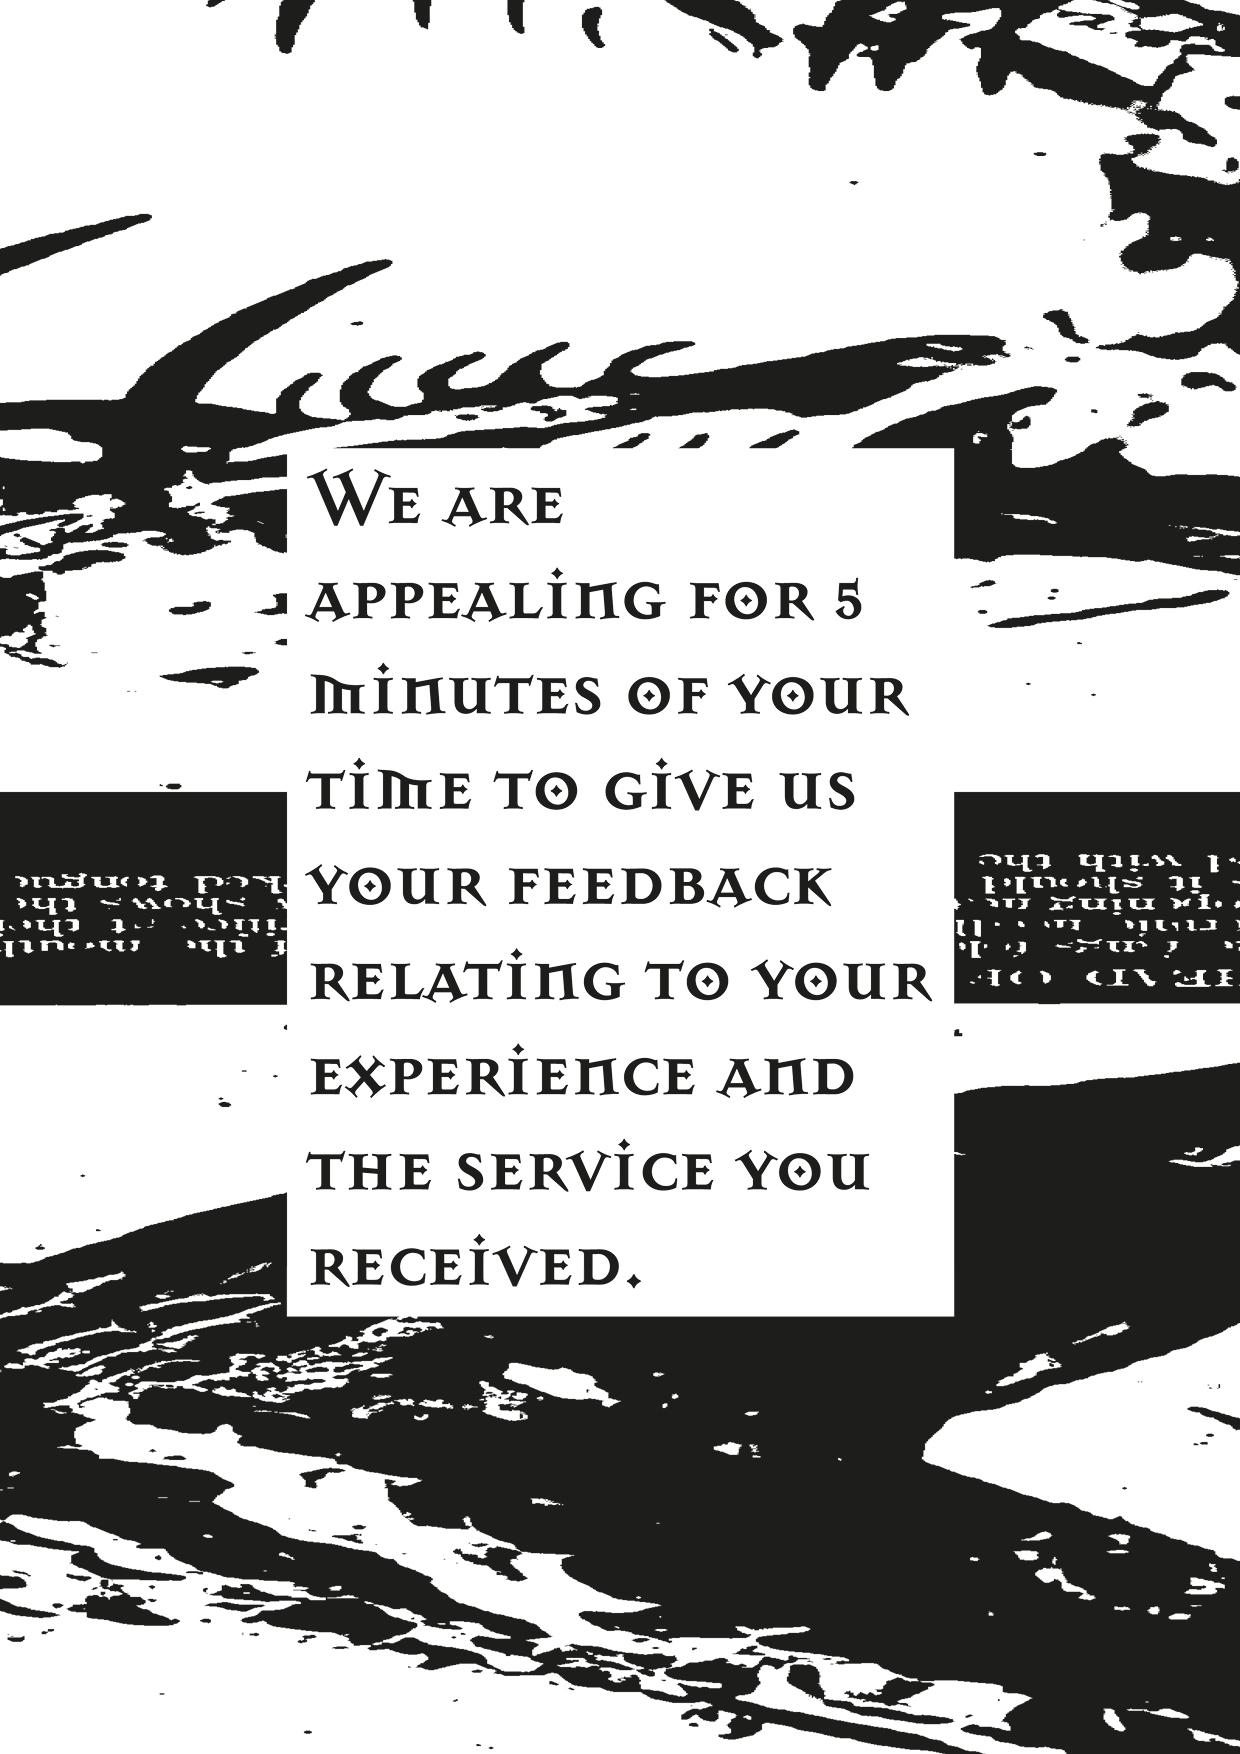 Unsubscribe-print-typography-design-James-Lee-Duffy26.jpg